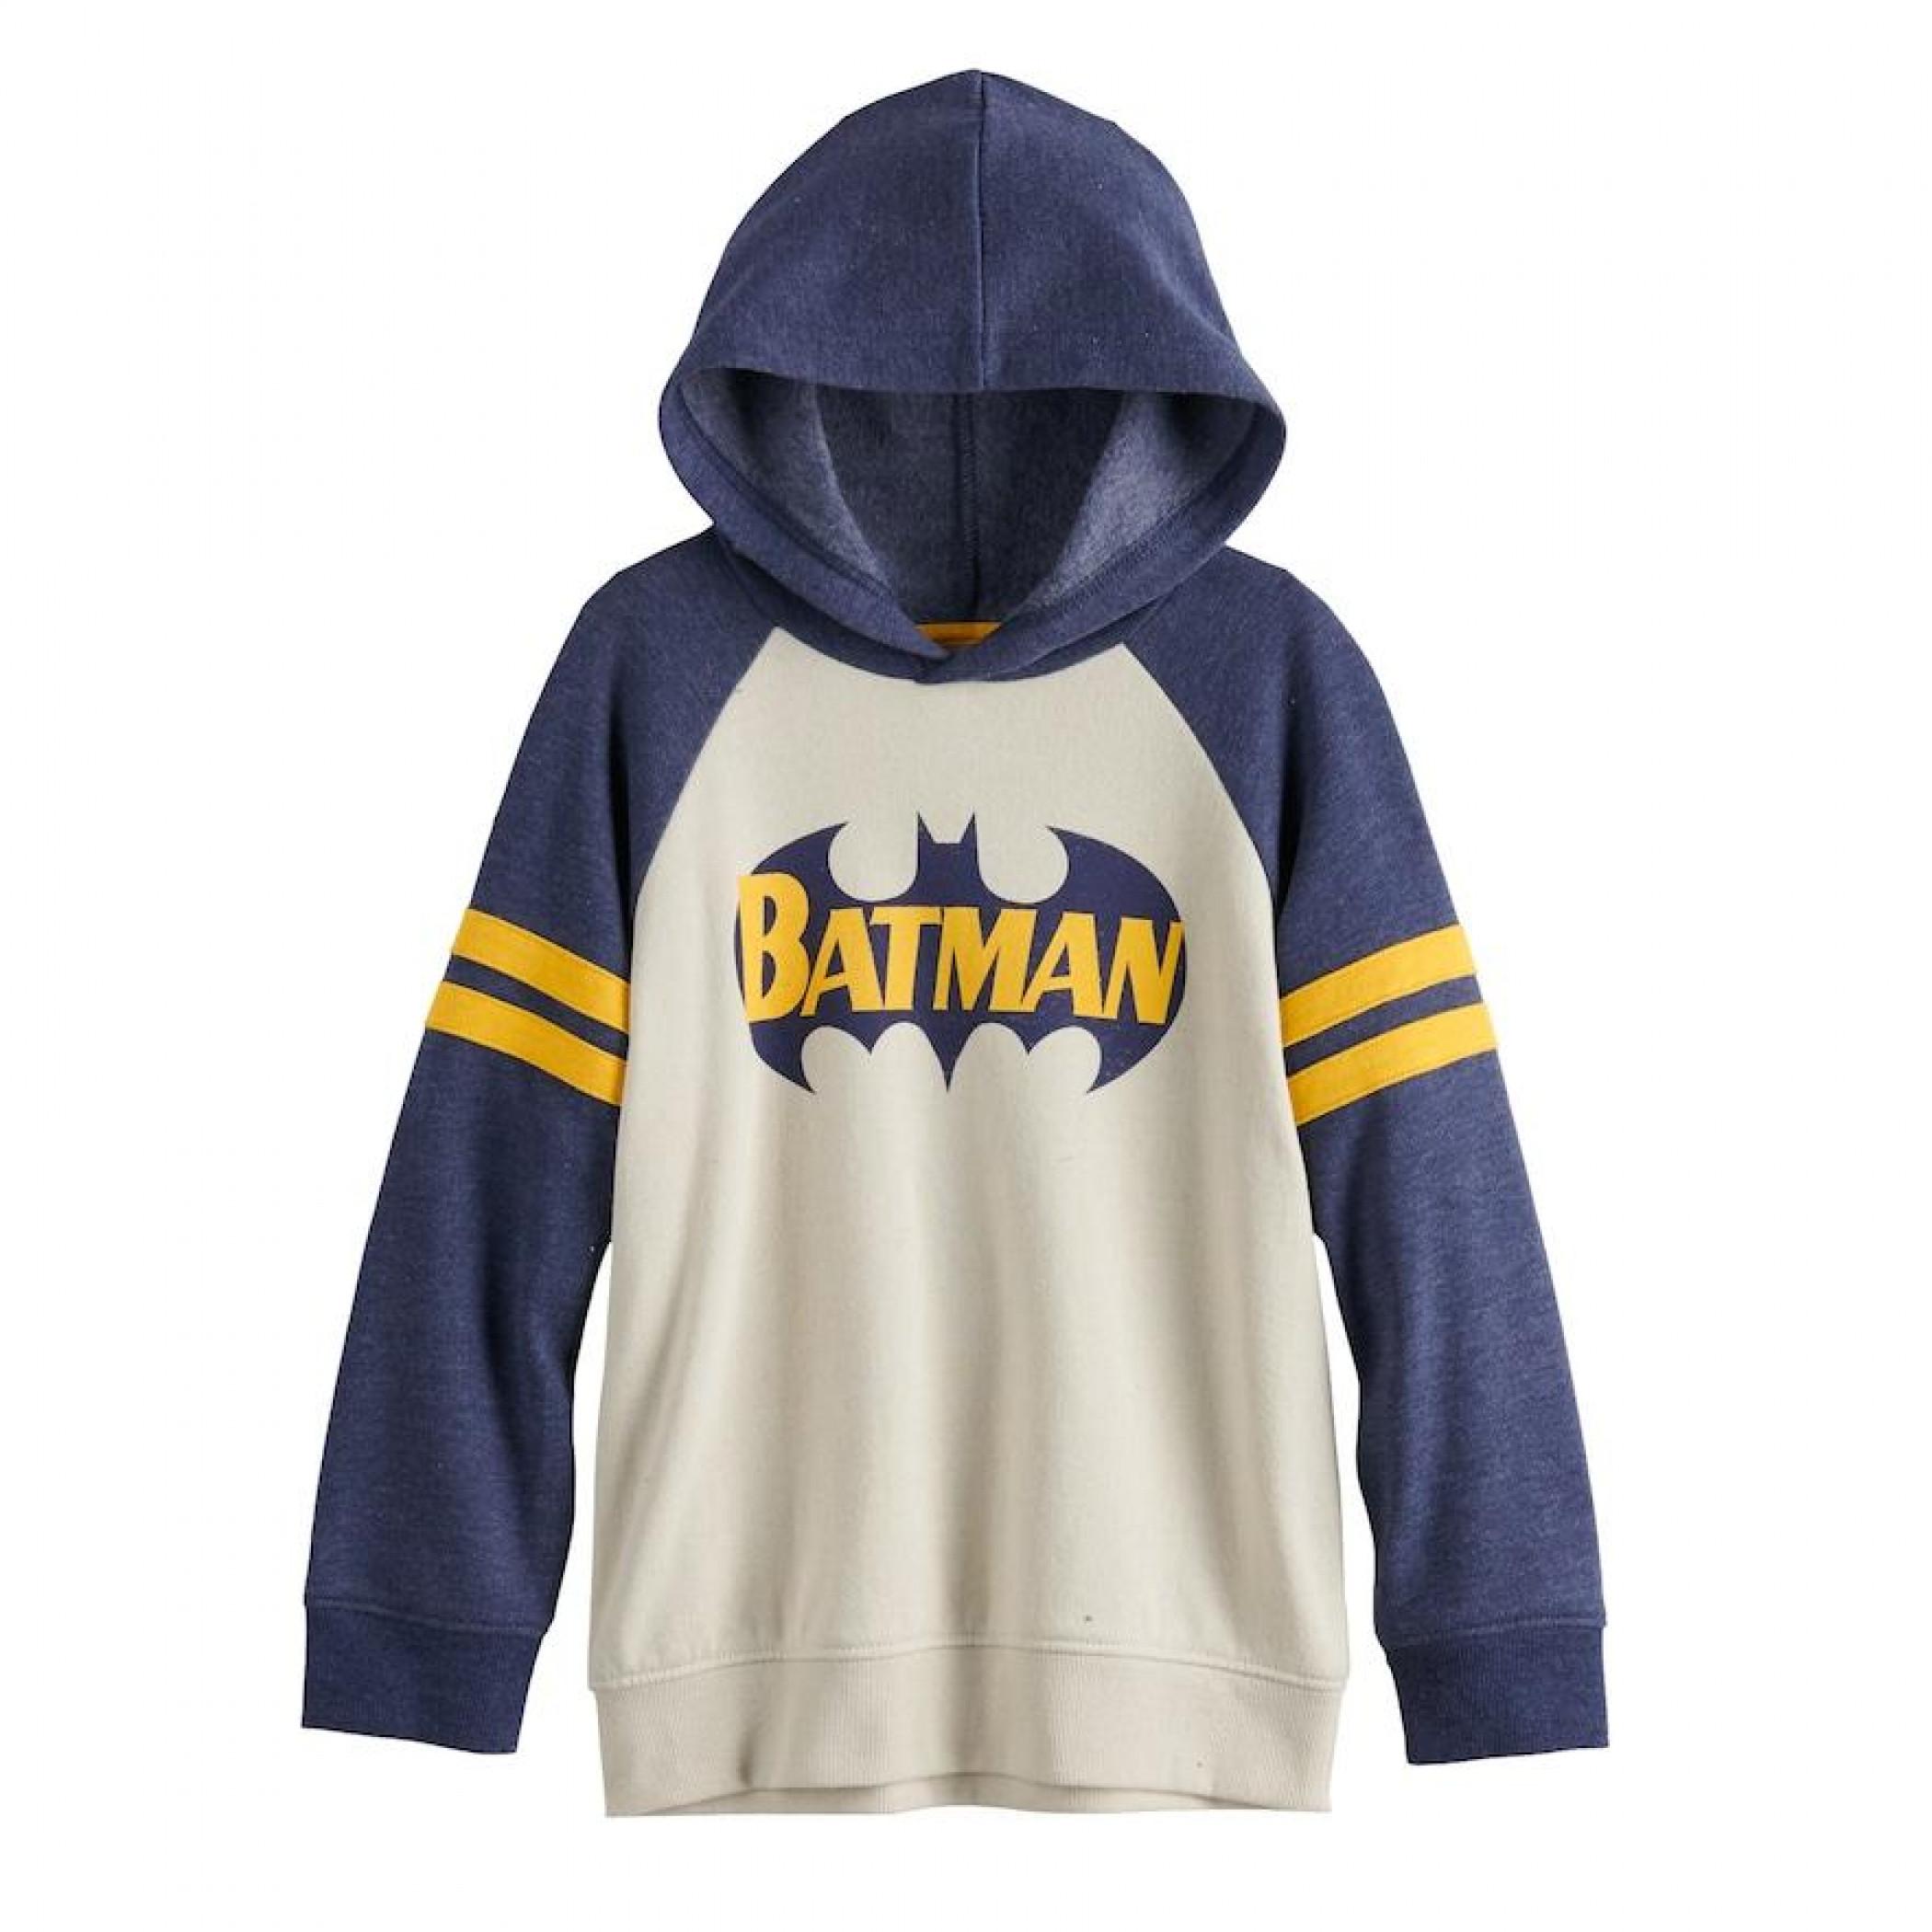 Batman Symbol Sonoma Goods for Life Boys Hoodie